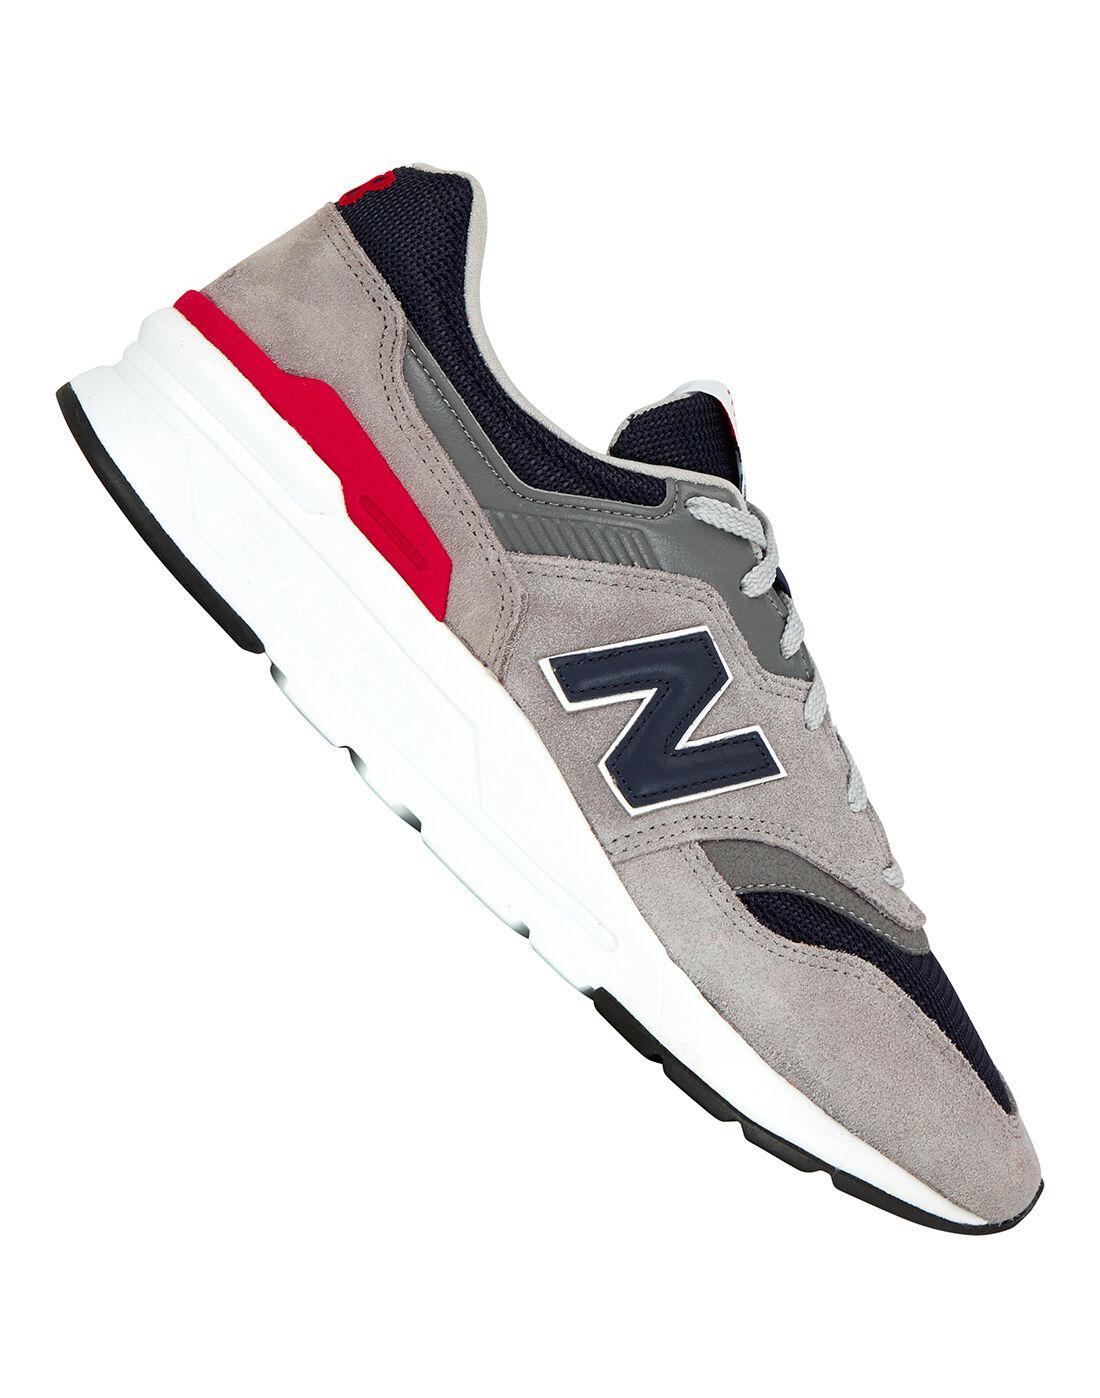 New Balance Mens 997H Trainer